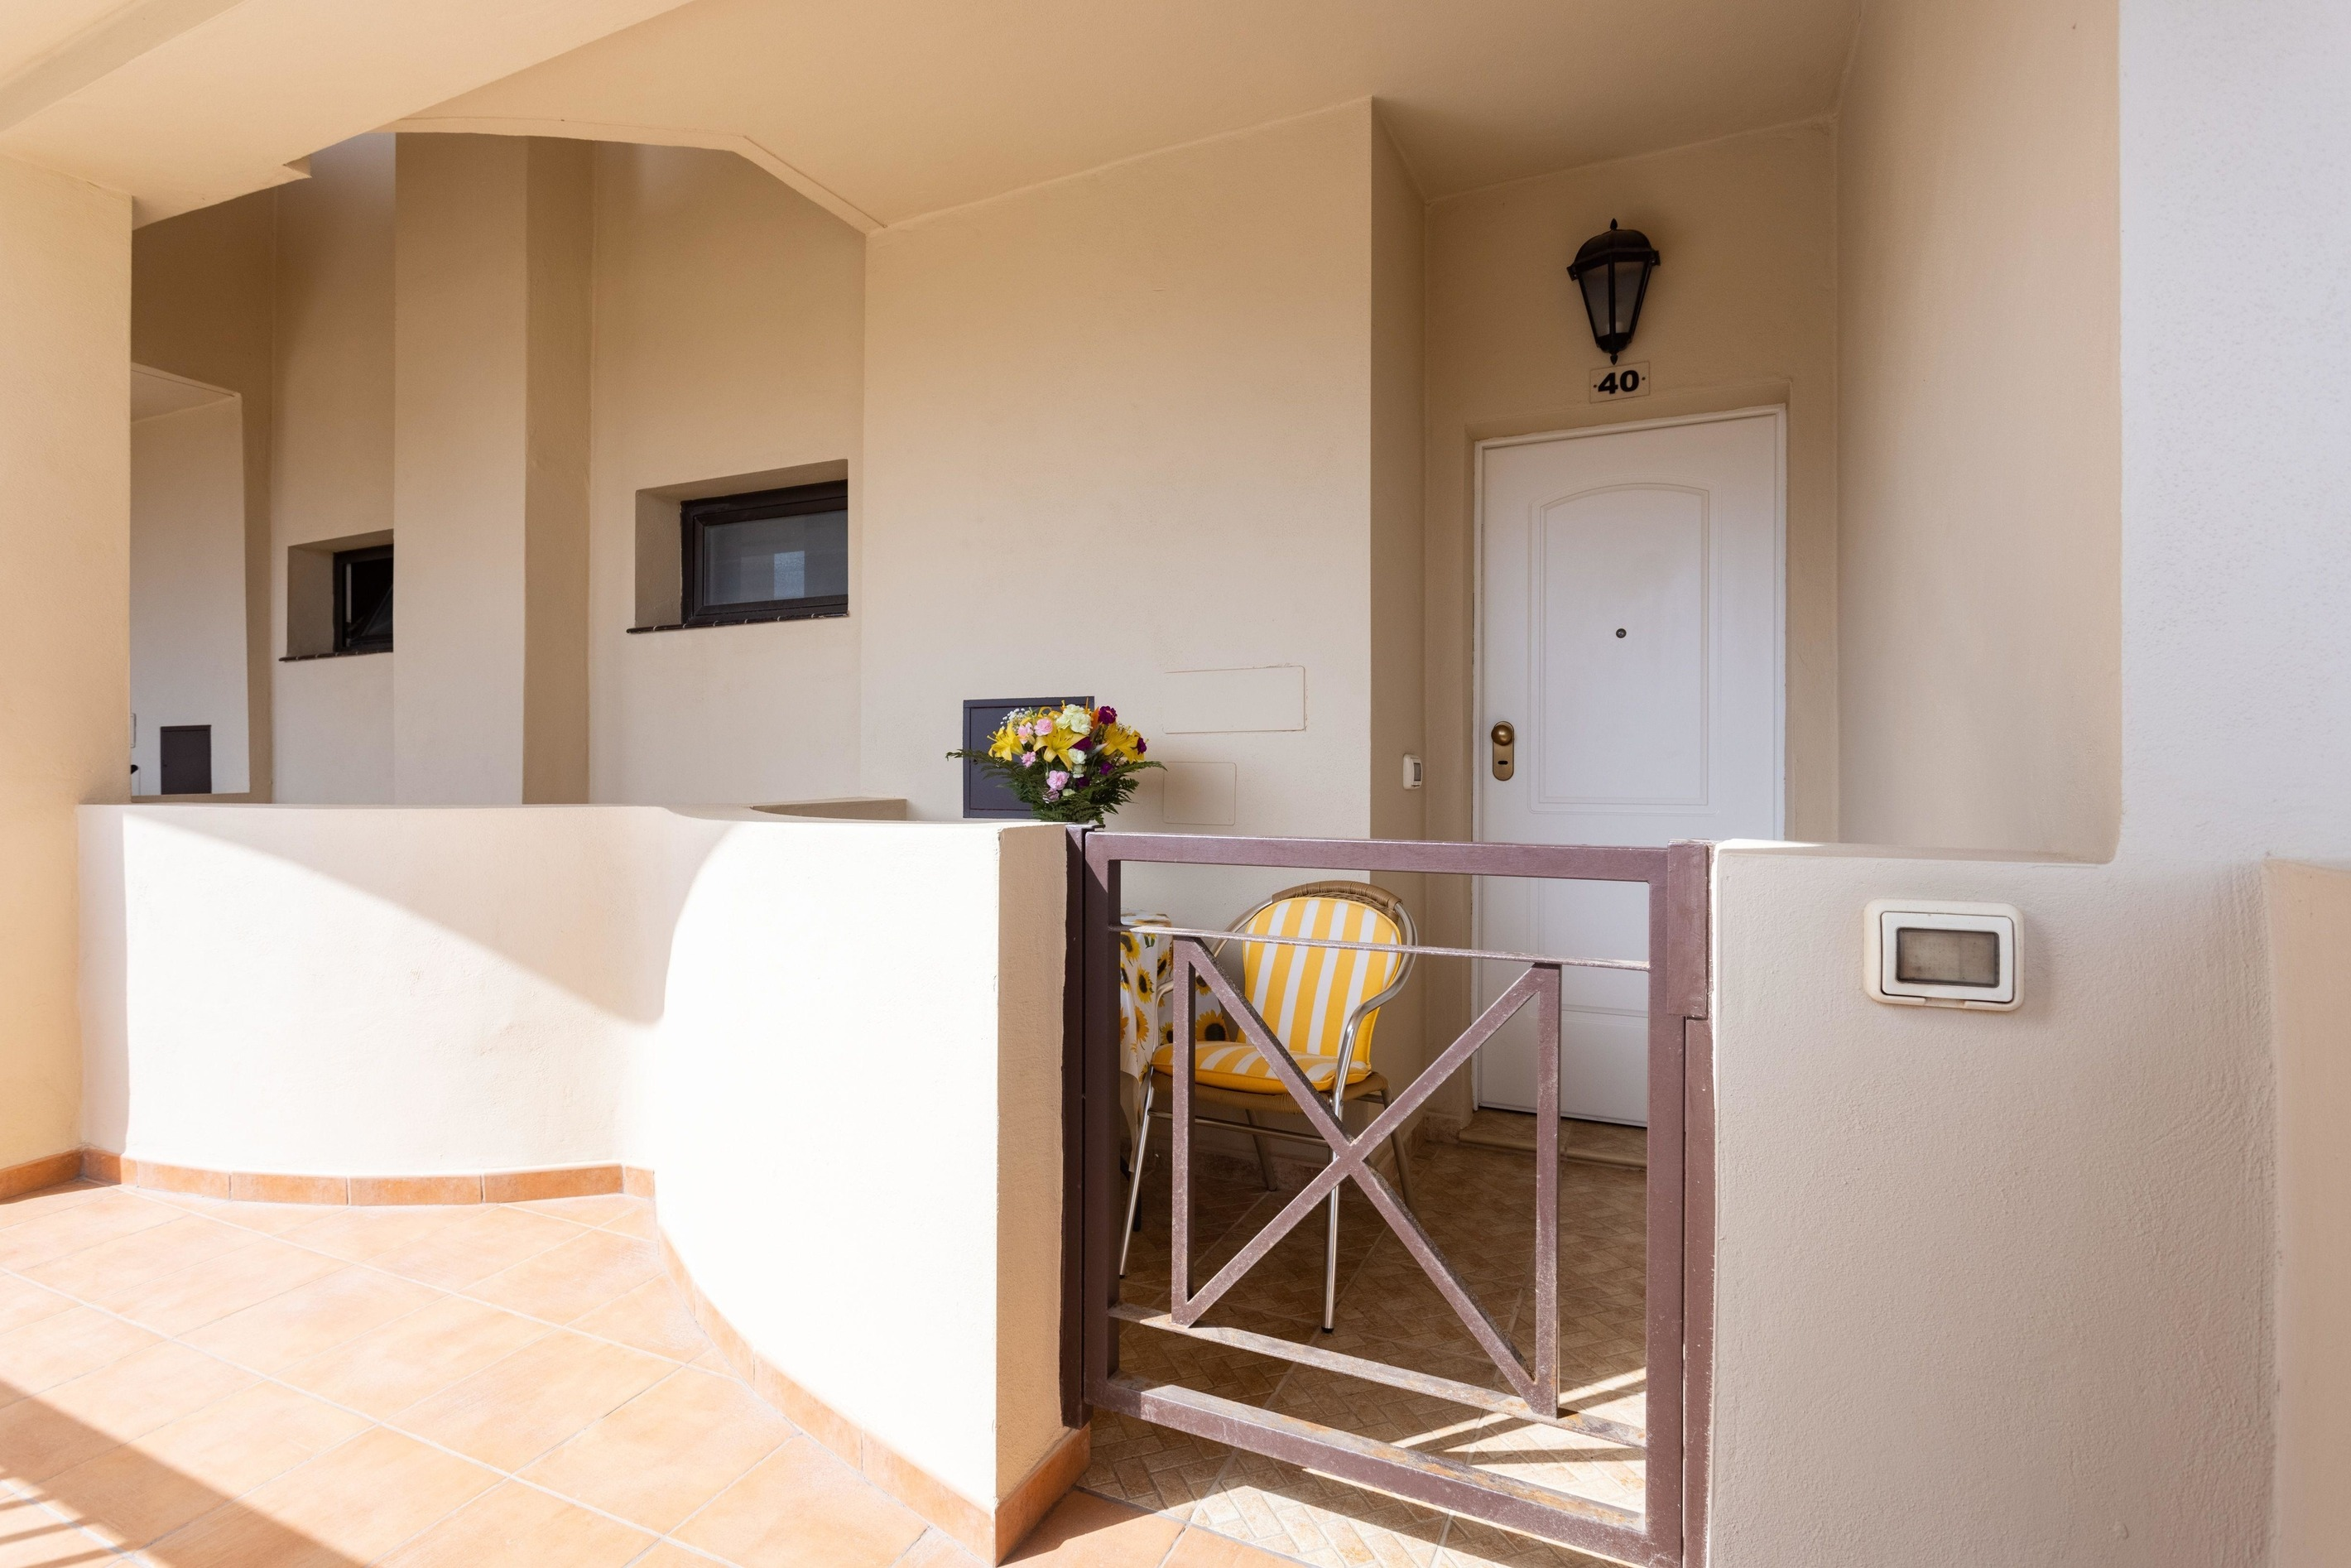 Appartement de vacances Fewo Mar y Teide Romantico, grosszügig, mit 2 Terrassen, Pool, Parkplatz,  Sicht auf Meer  (2492990), Puerto de la Cruz, Ténérife, Iles Canaries, Espagne, image 11